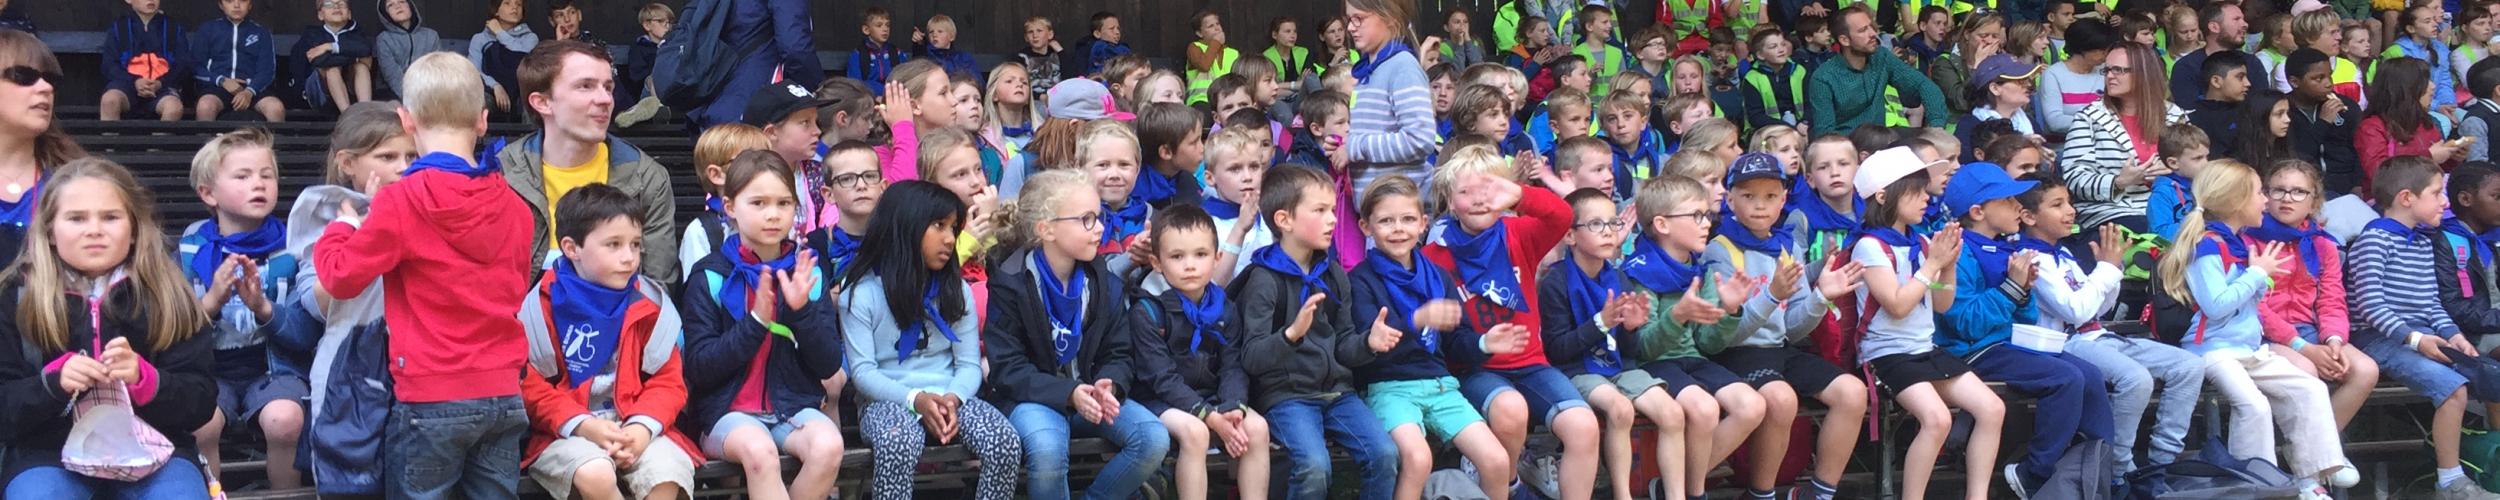 Schoolreis - Bellewaerde